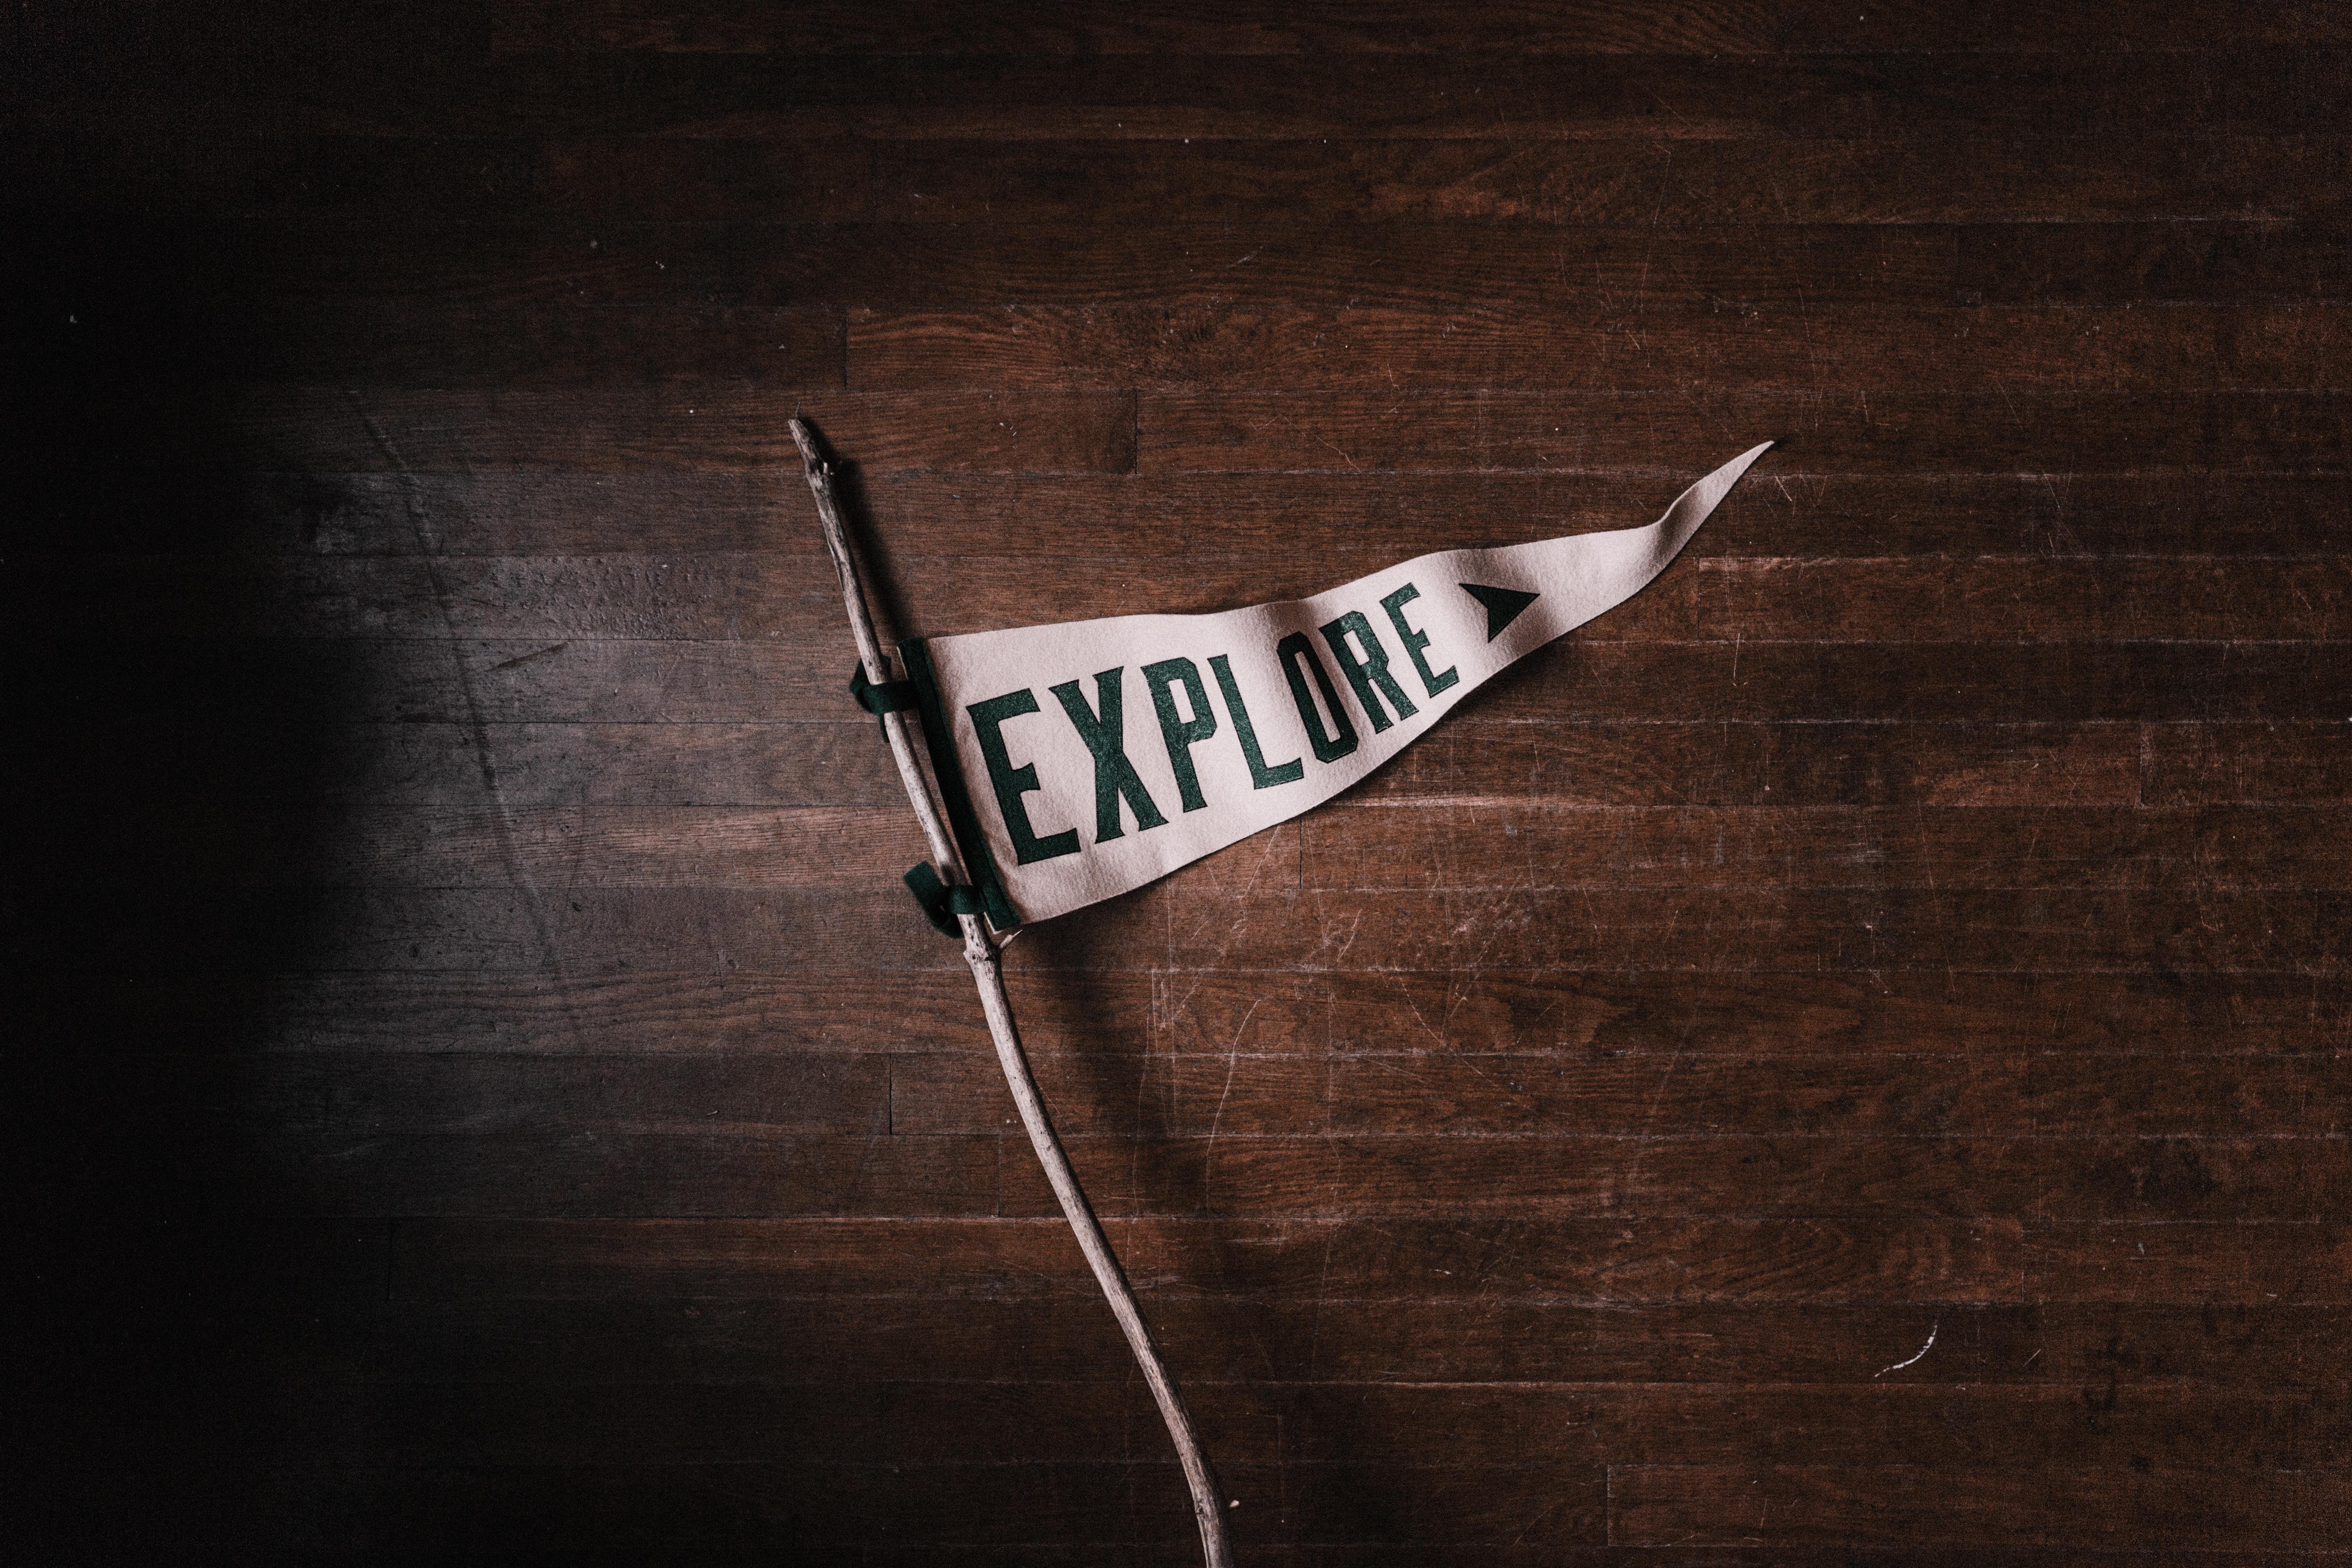 Explorer 1hr x 3